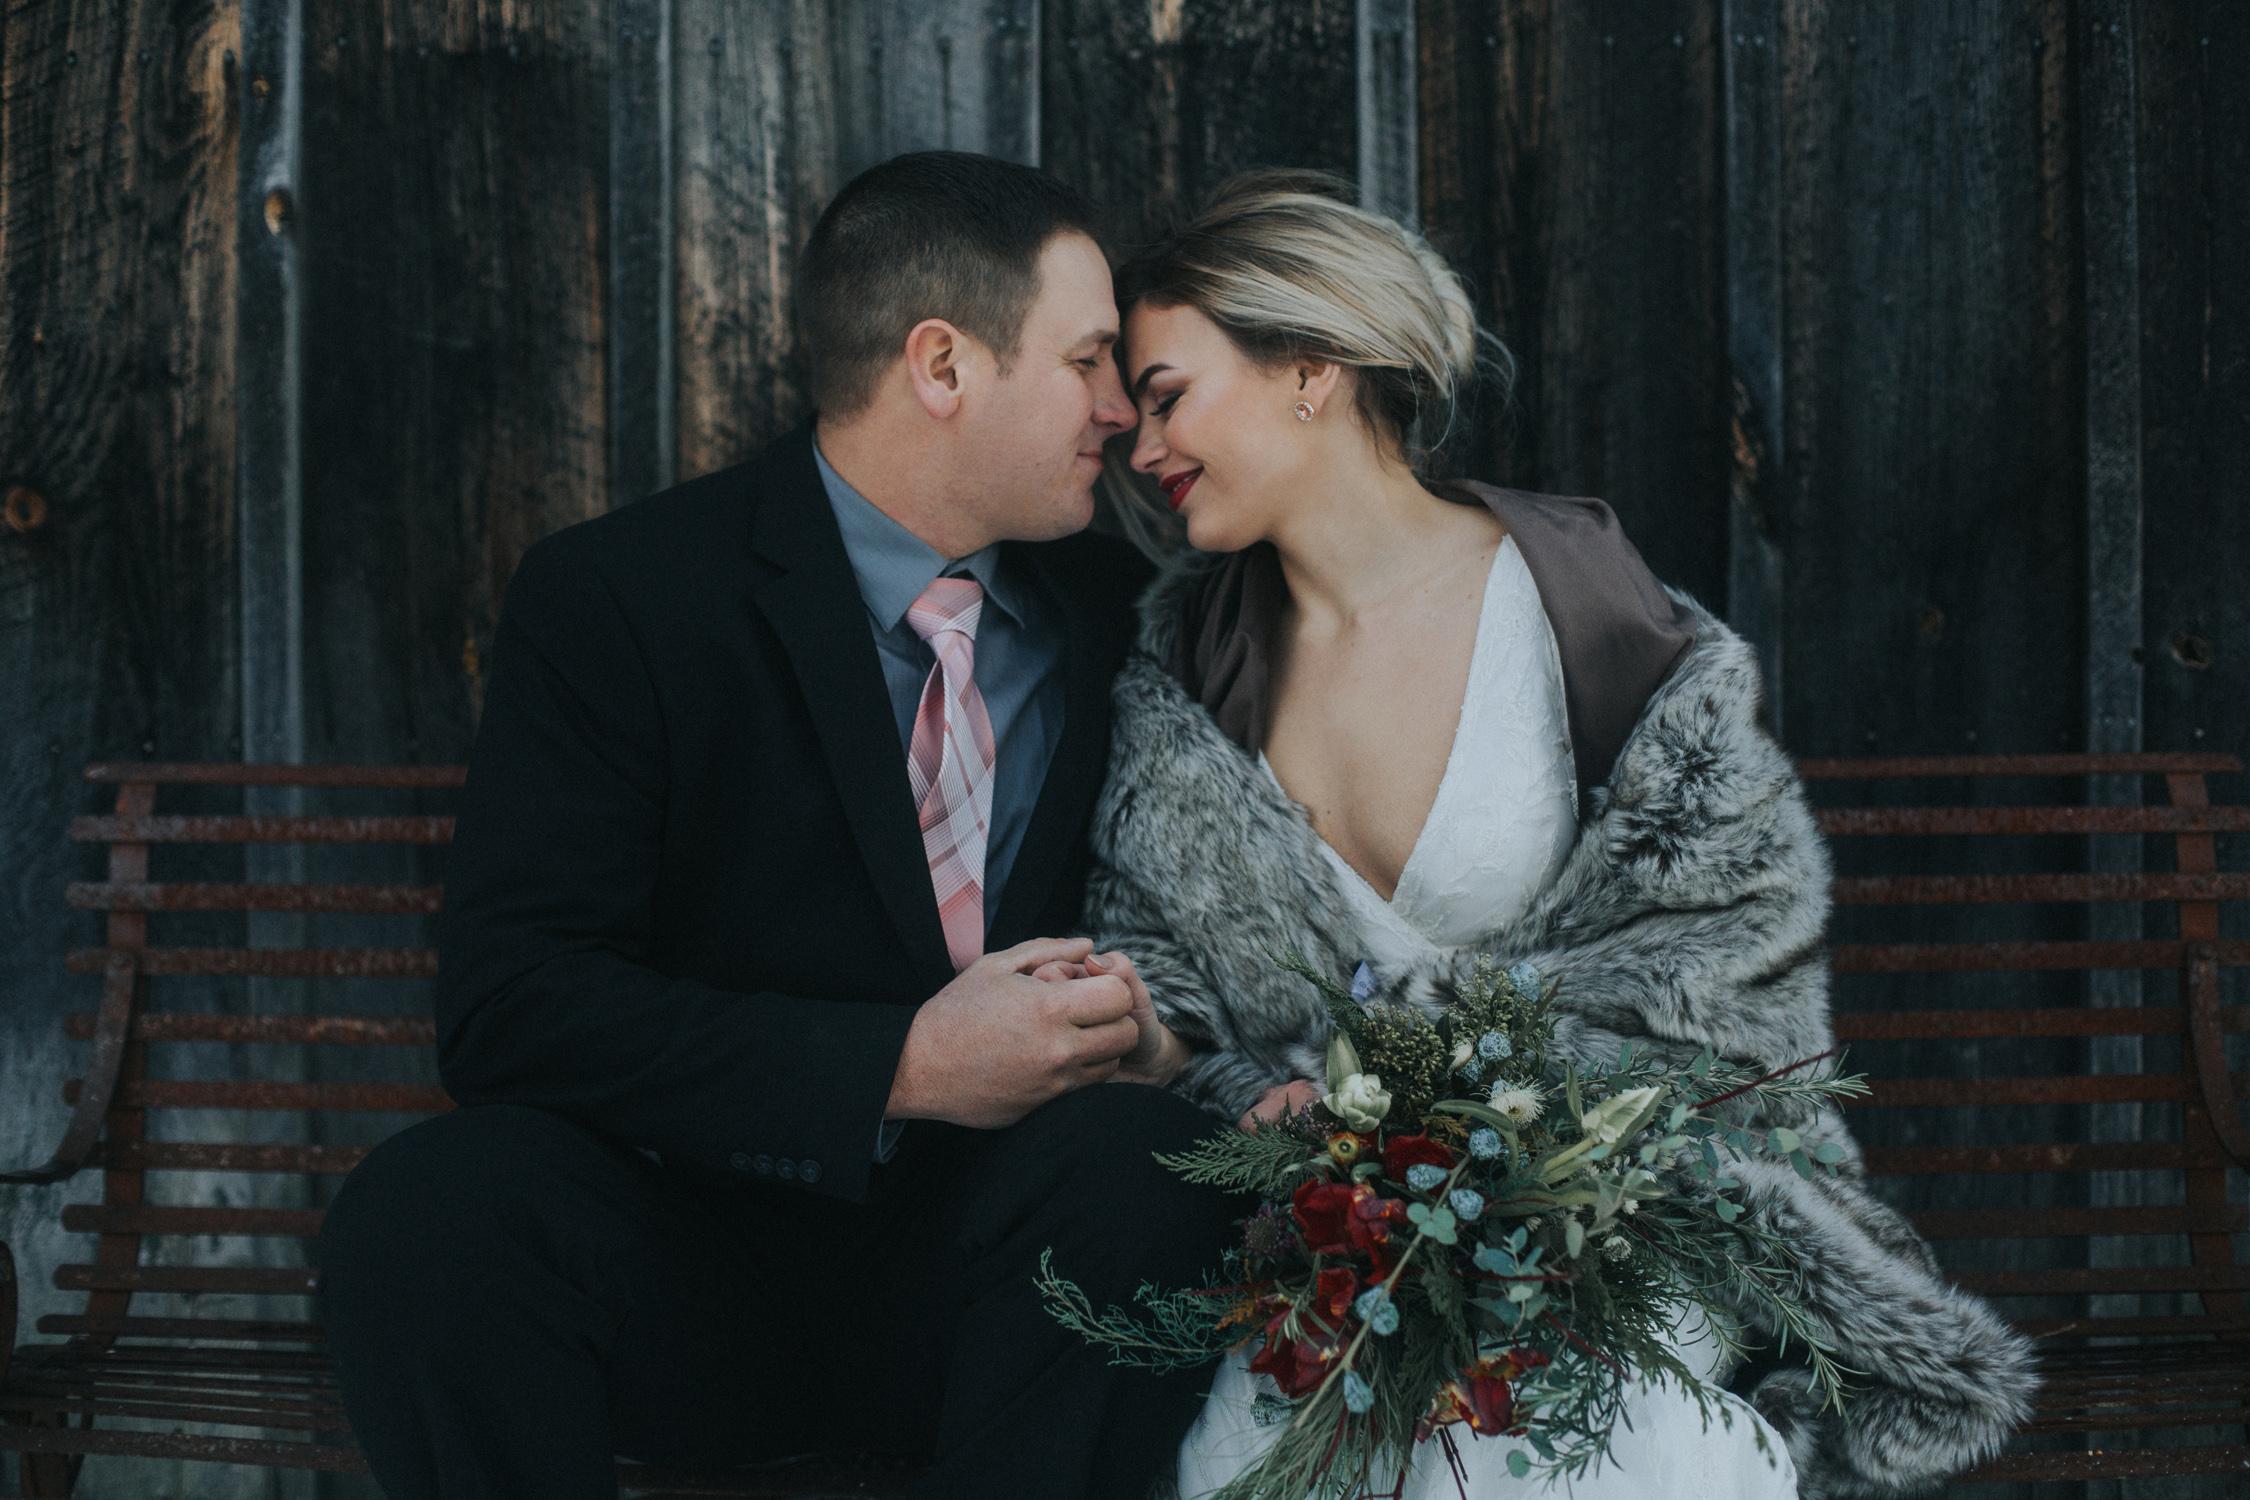 mnd_farm_winter_wedding_024.jpg